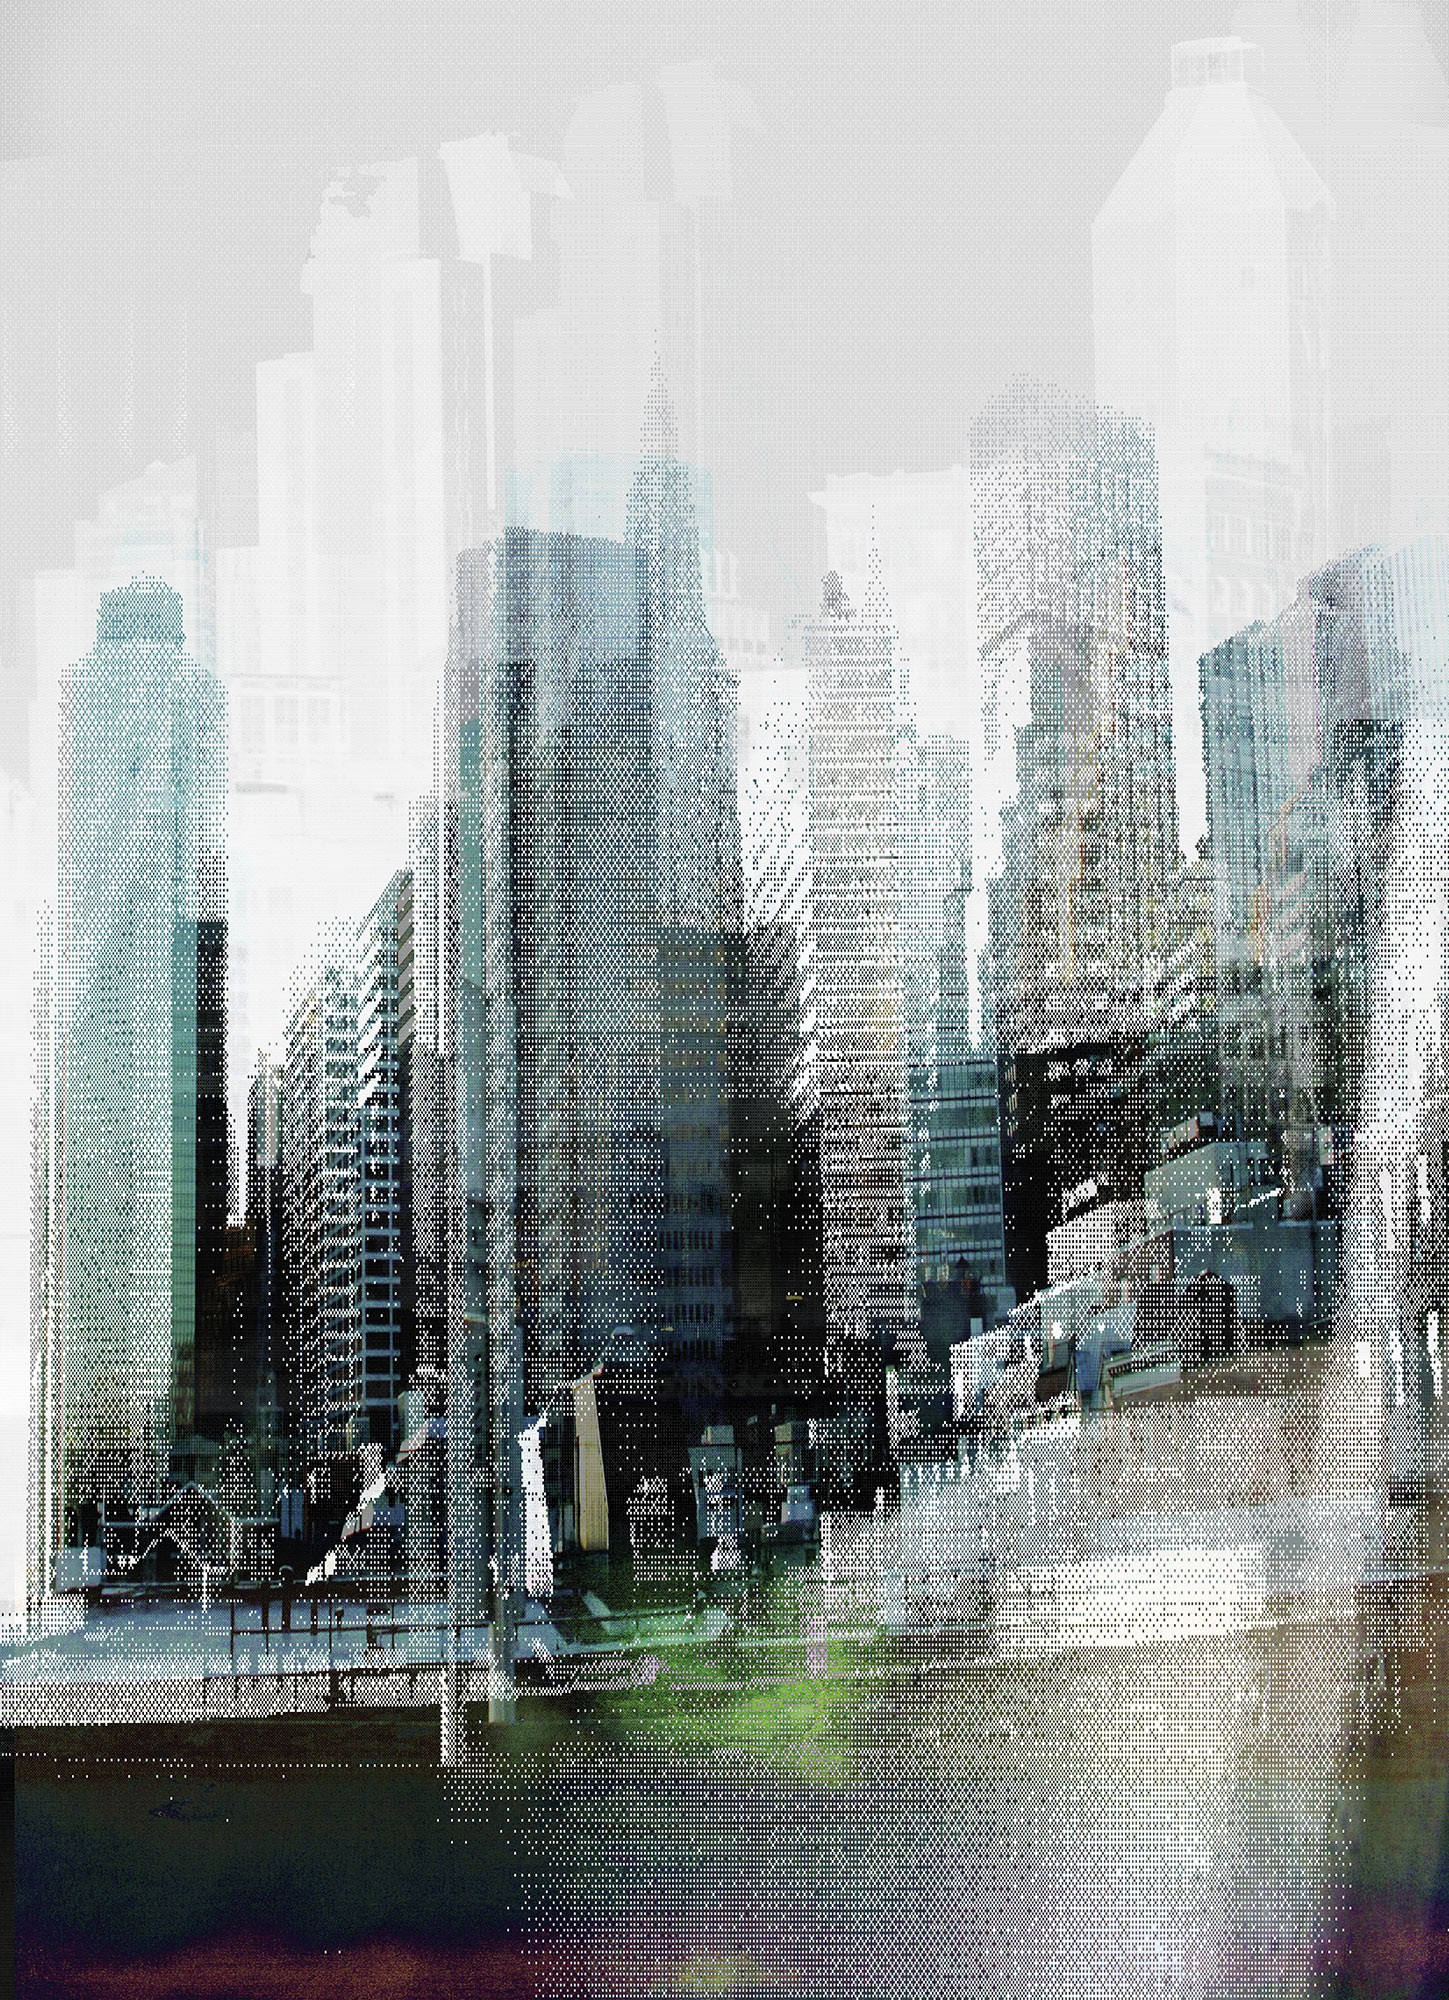 Modern városi hangulat fali poszter